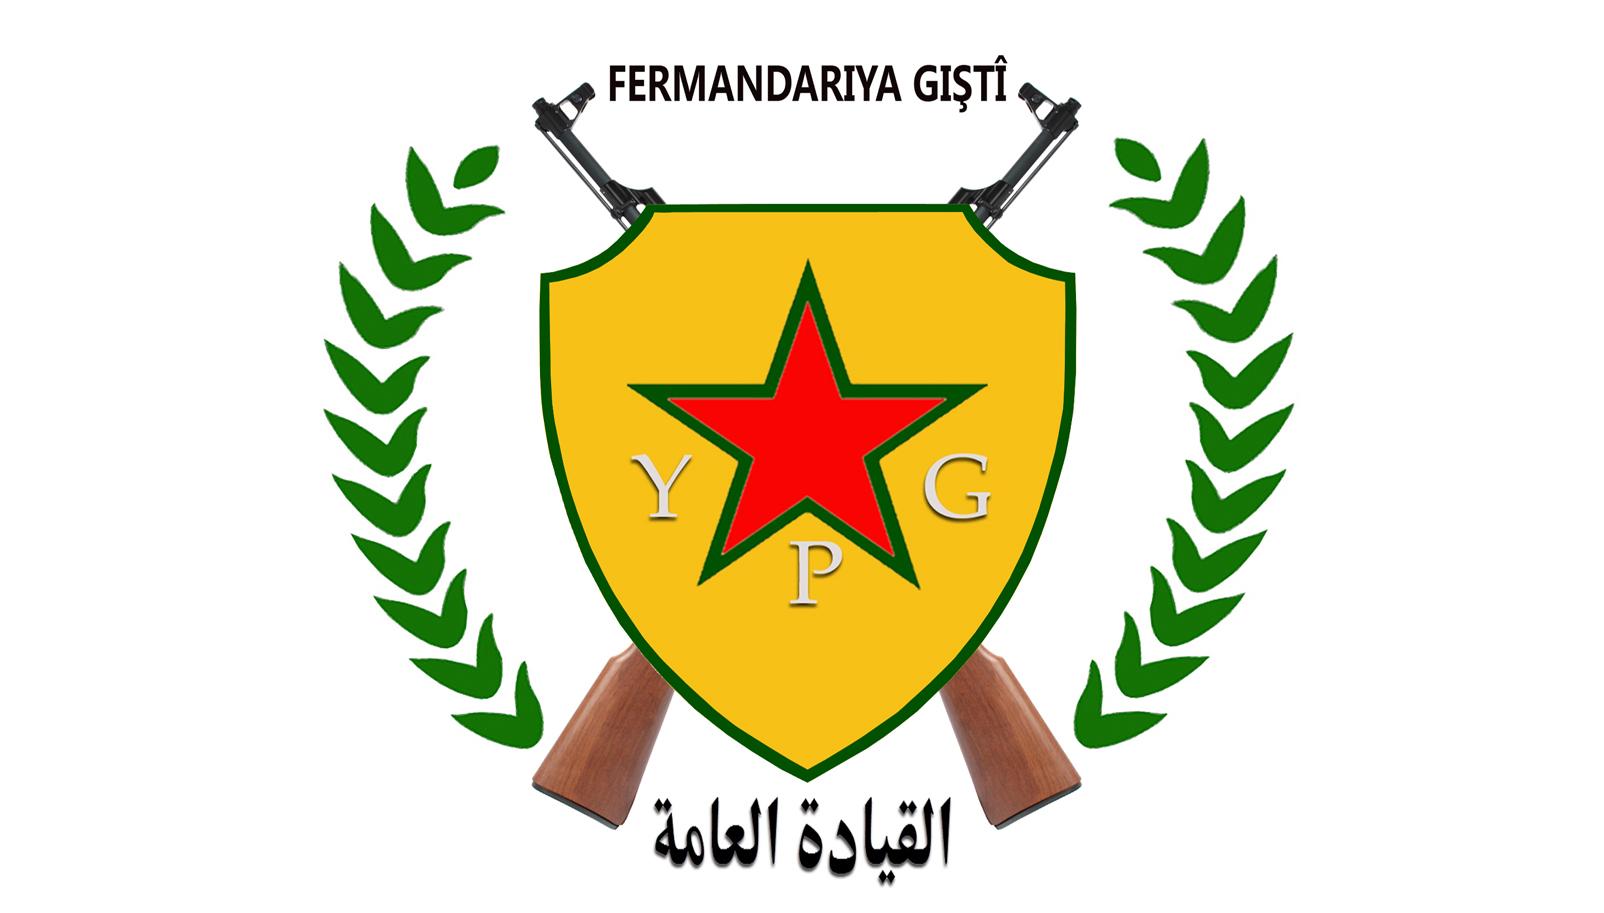 YPG: Turkish army killed a civilian from Kobanê